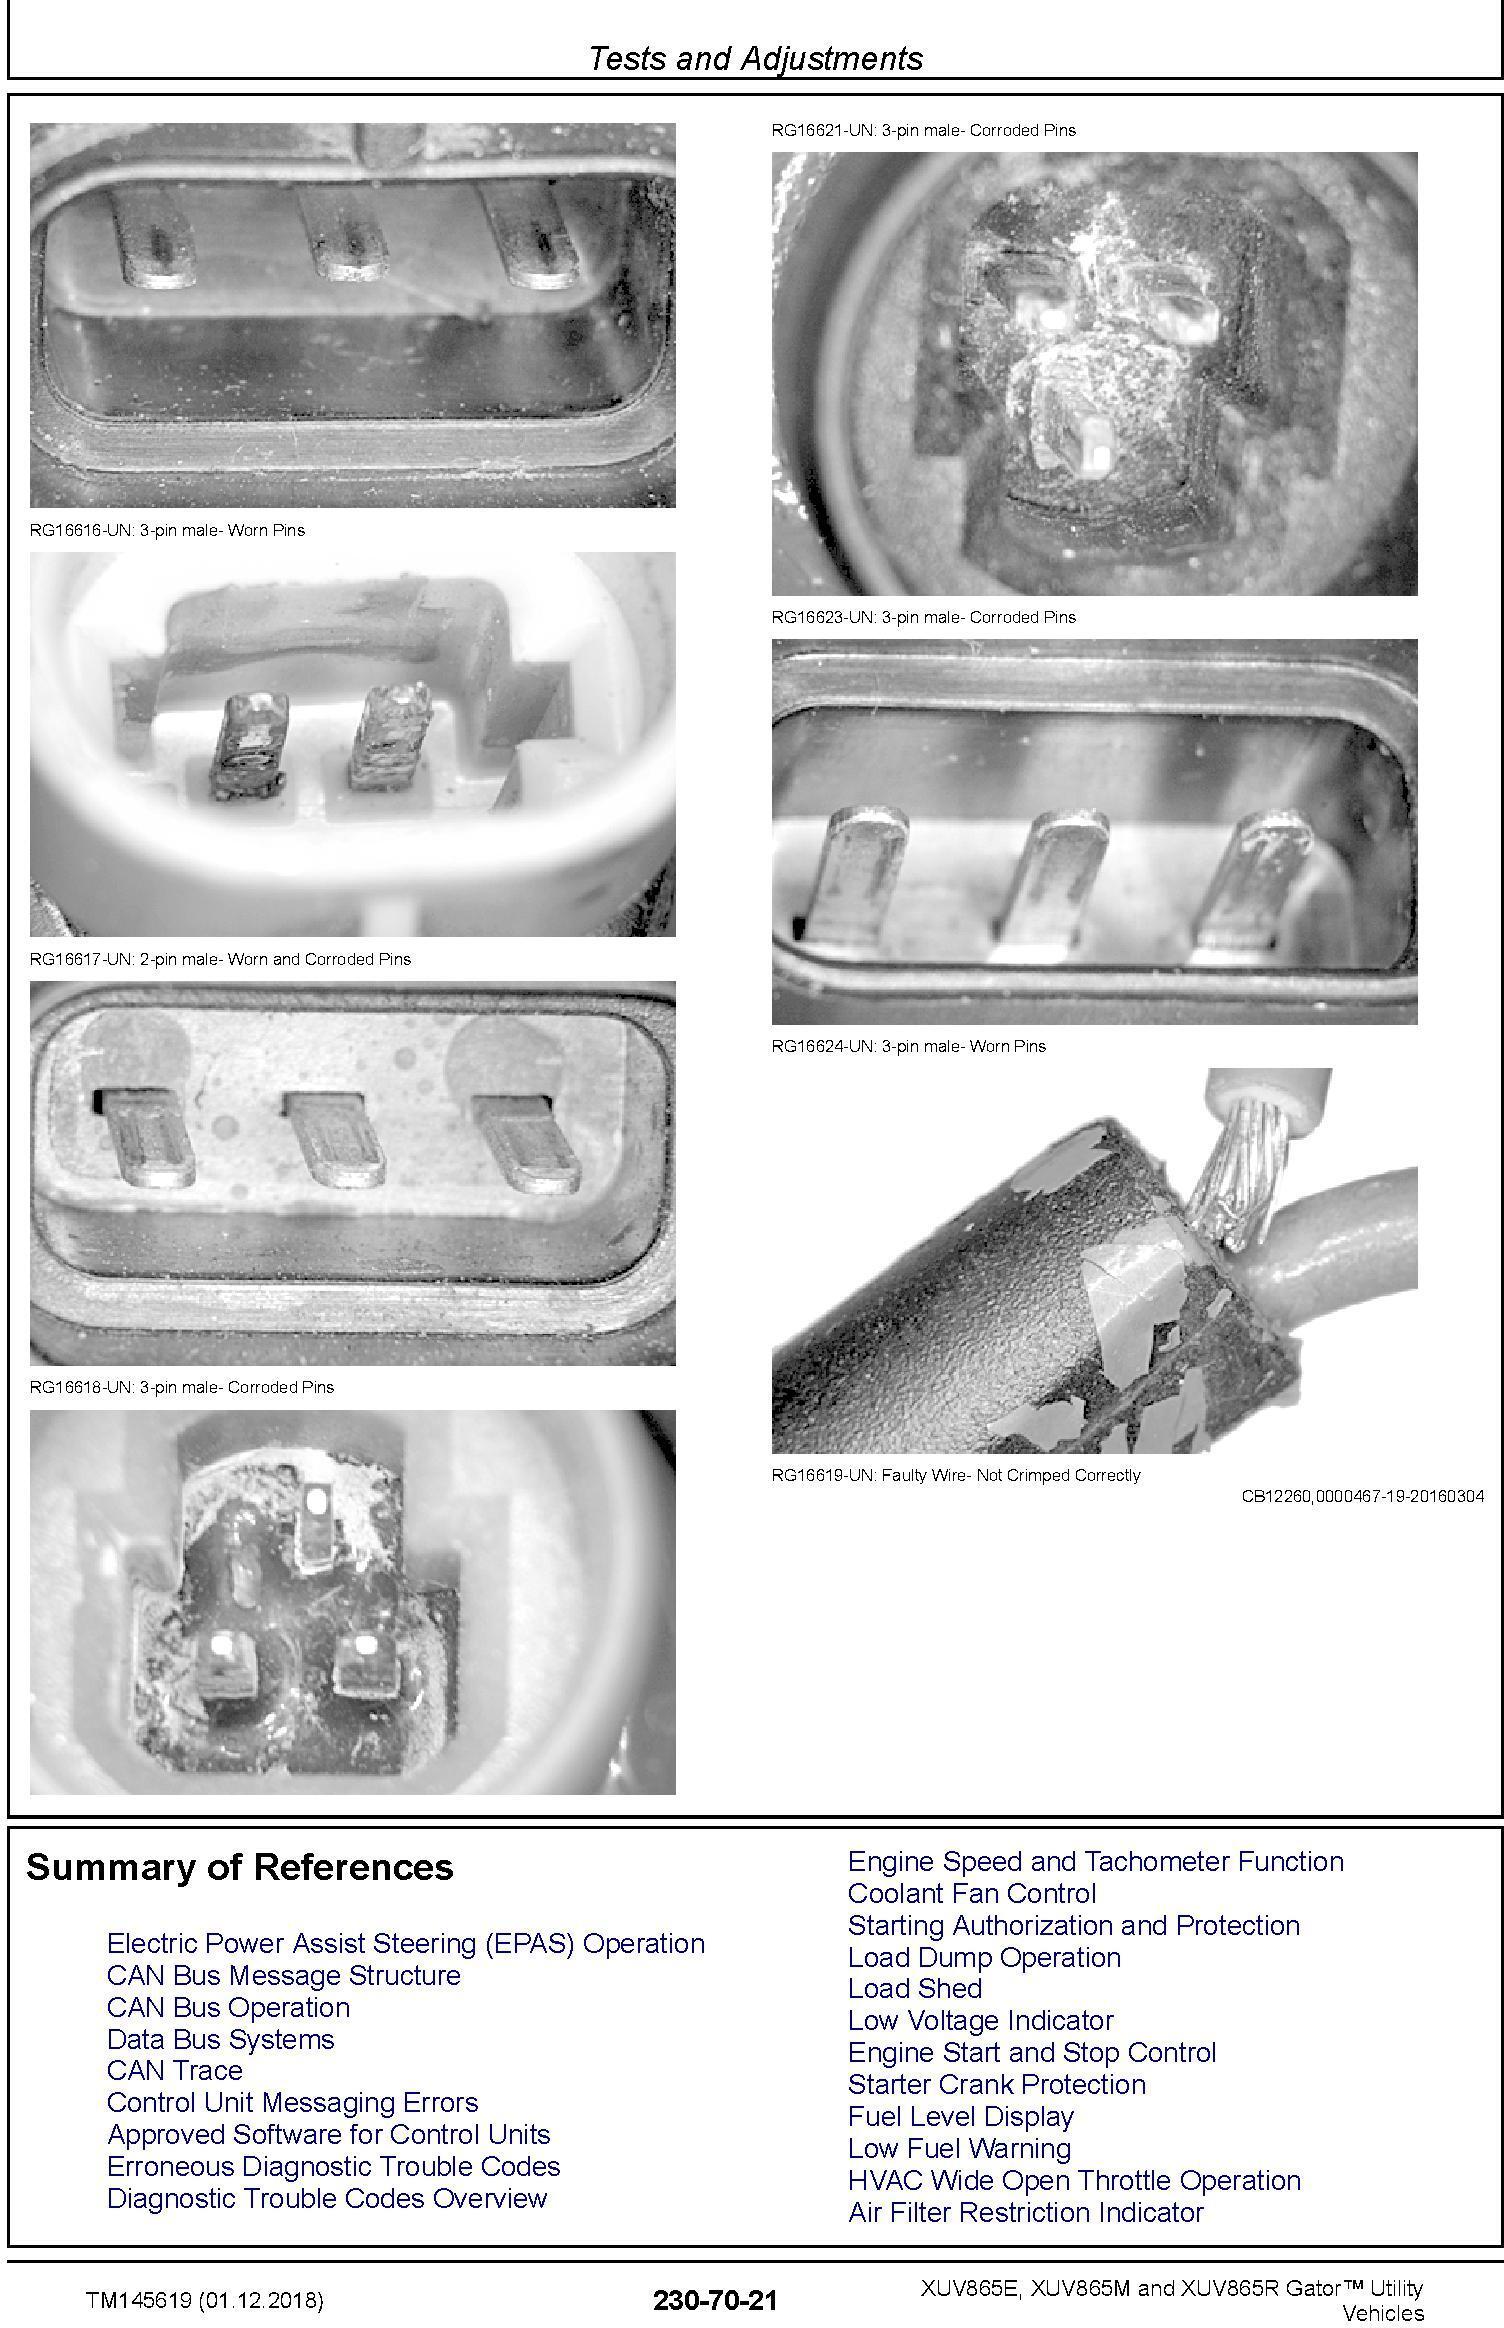 John Deere XUV865E, XUV865M, XUV865R Gator Utility Vehicles (SN.010001-) Technical Manual (TM145619) - 2